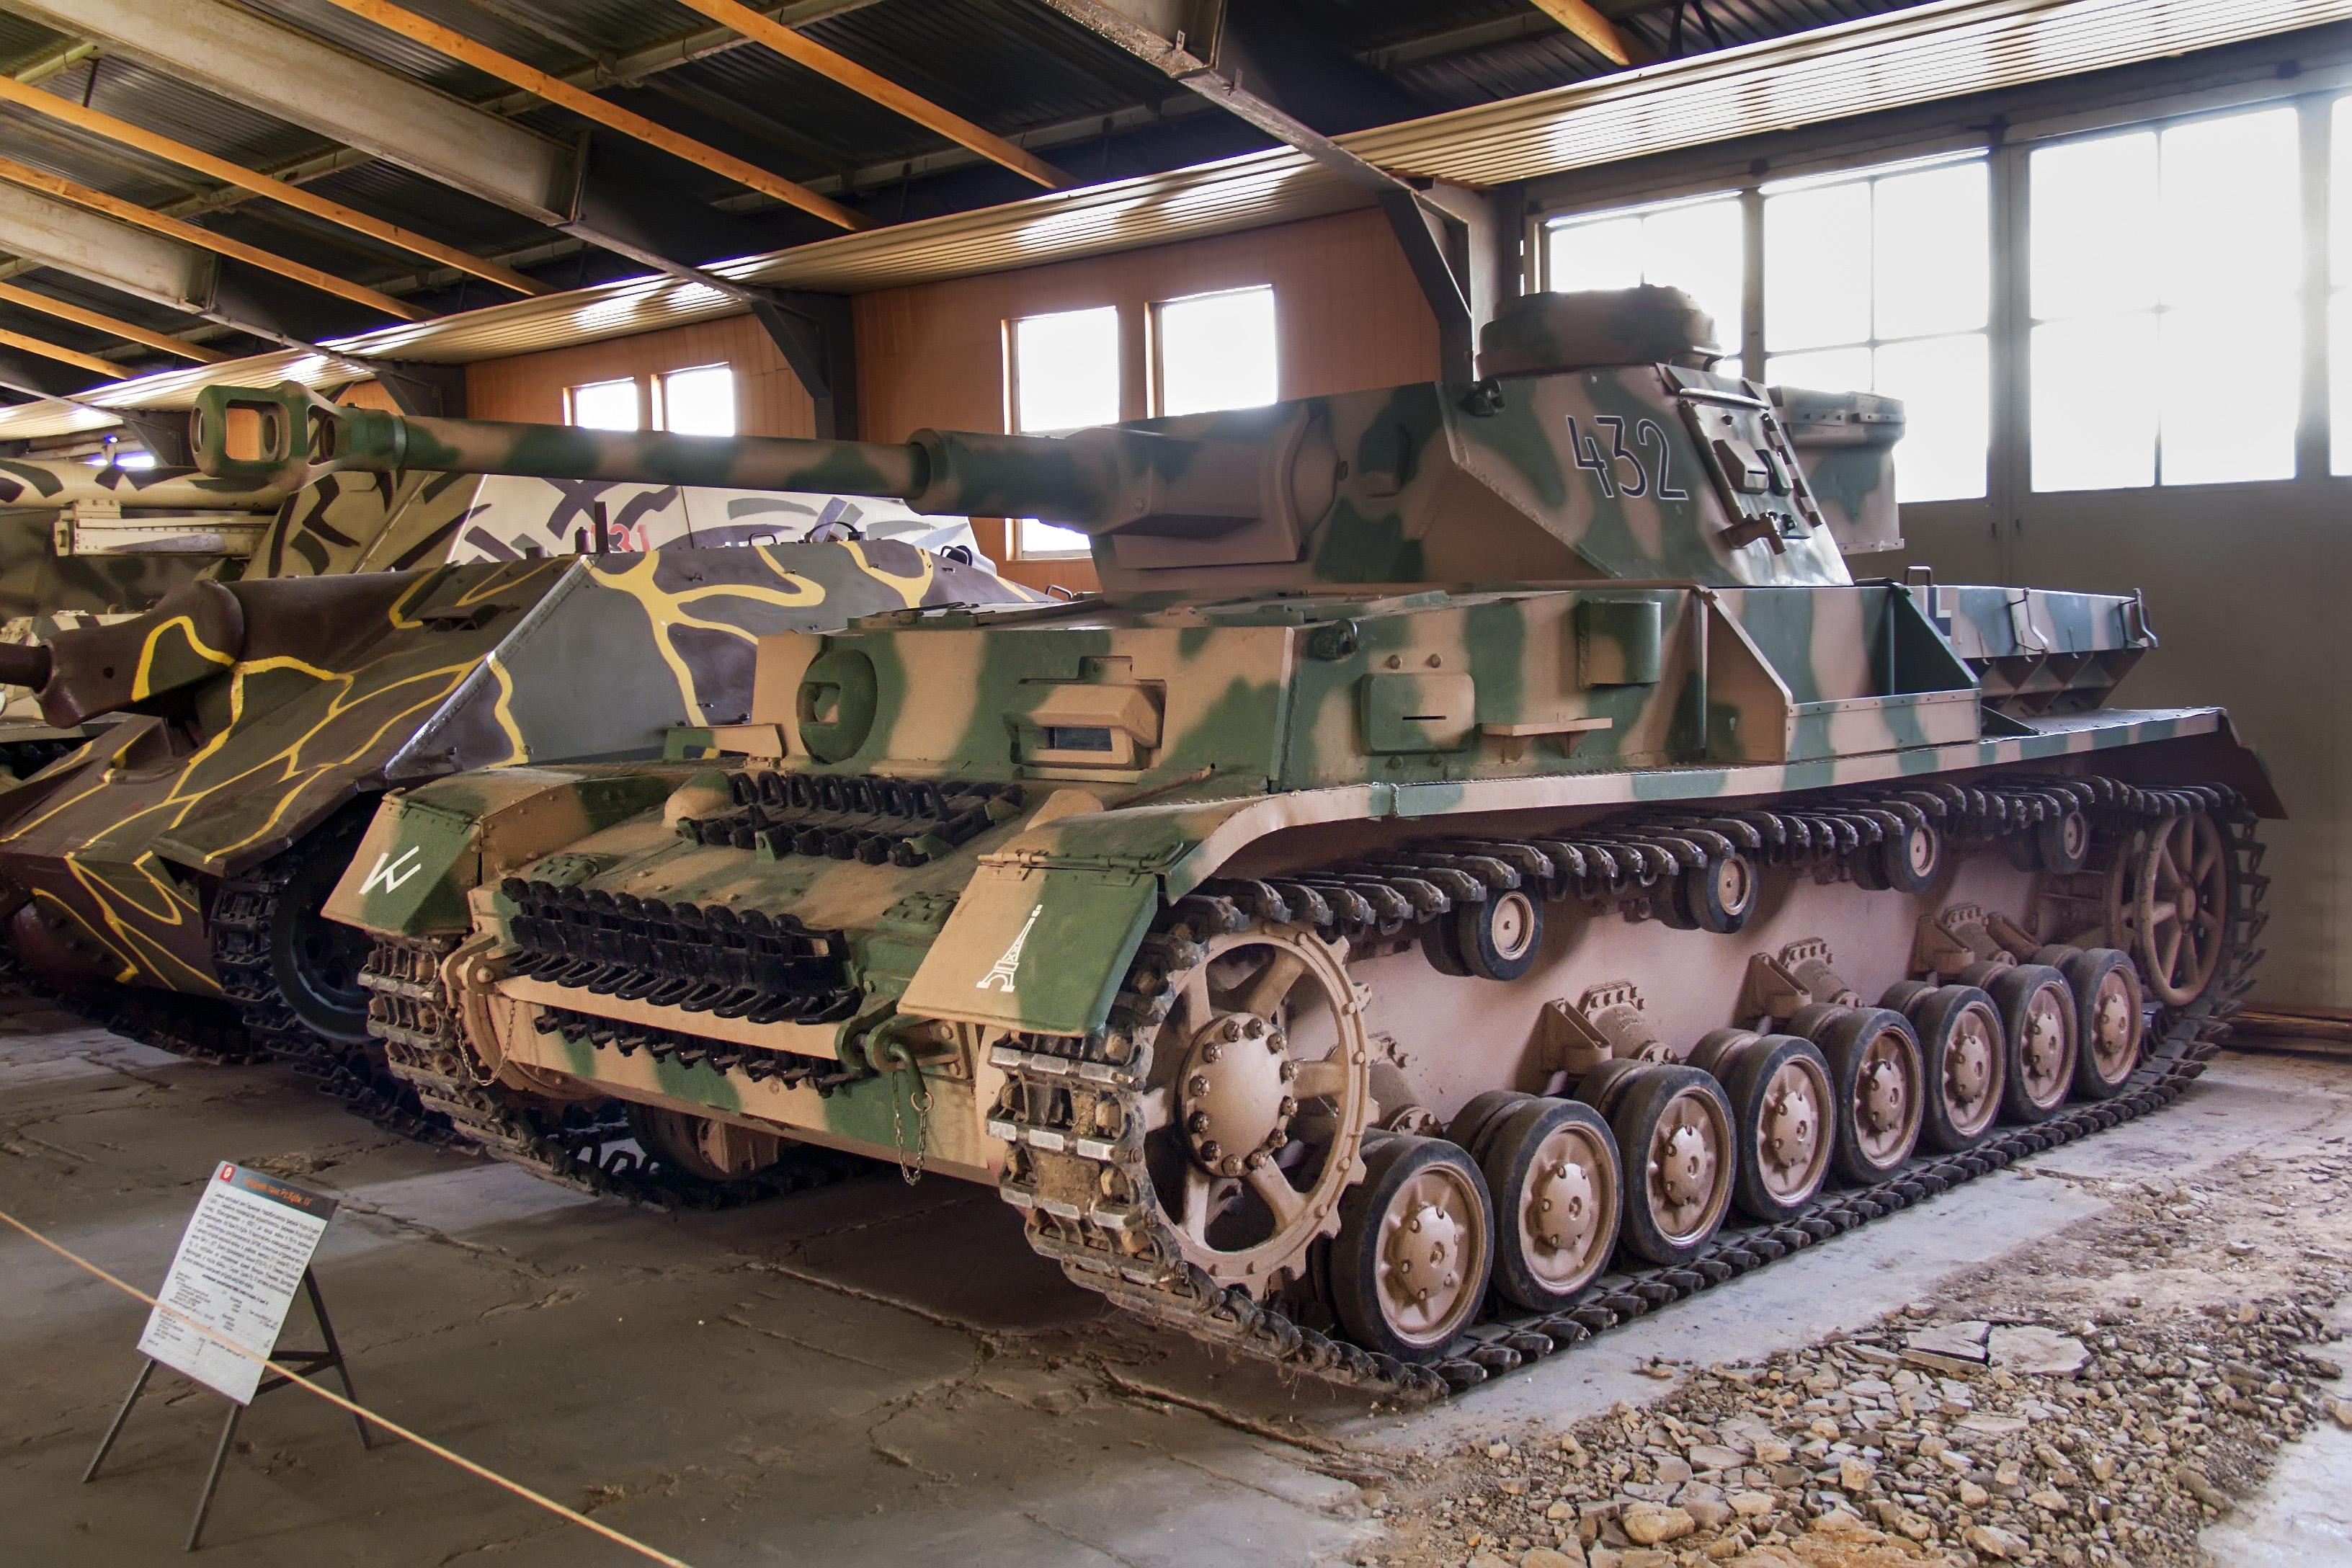 https://upload.wikimedia.org/wikipedia/commons/2/2a/Pz.Kpfw_IV_Ausf.G_in_the_Kubinka_Museum_01.jpg